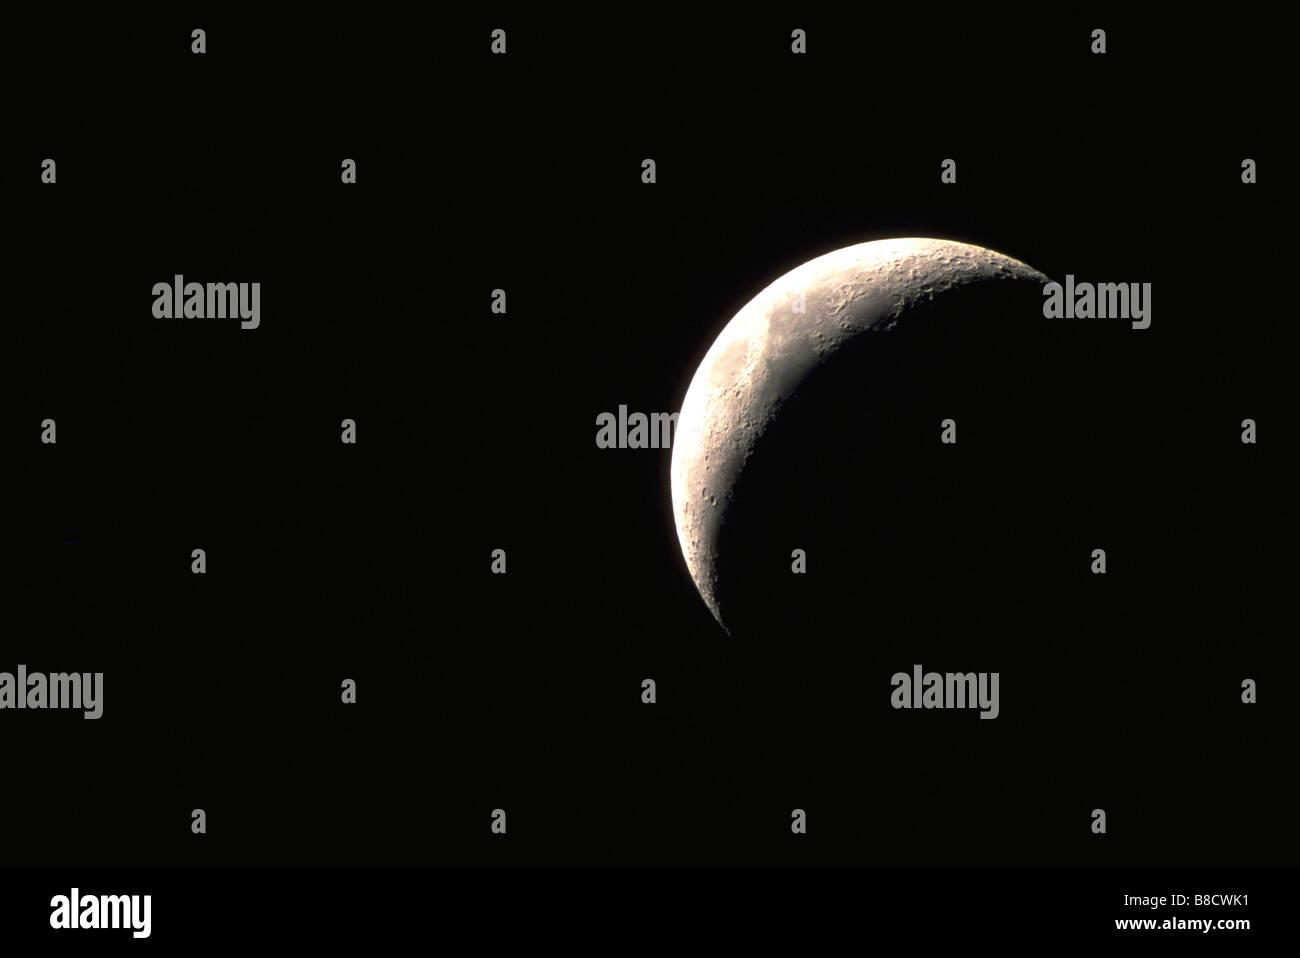 FV1061, Dave Nunuk; Crescent moon, black sky - Stock Image